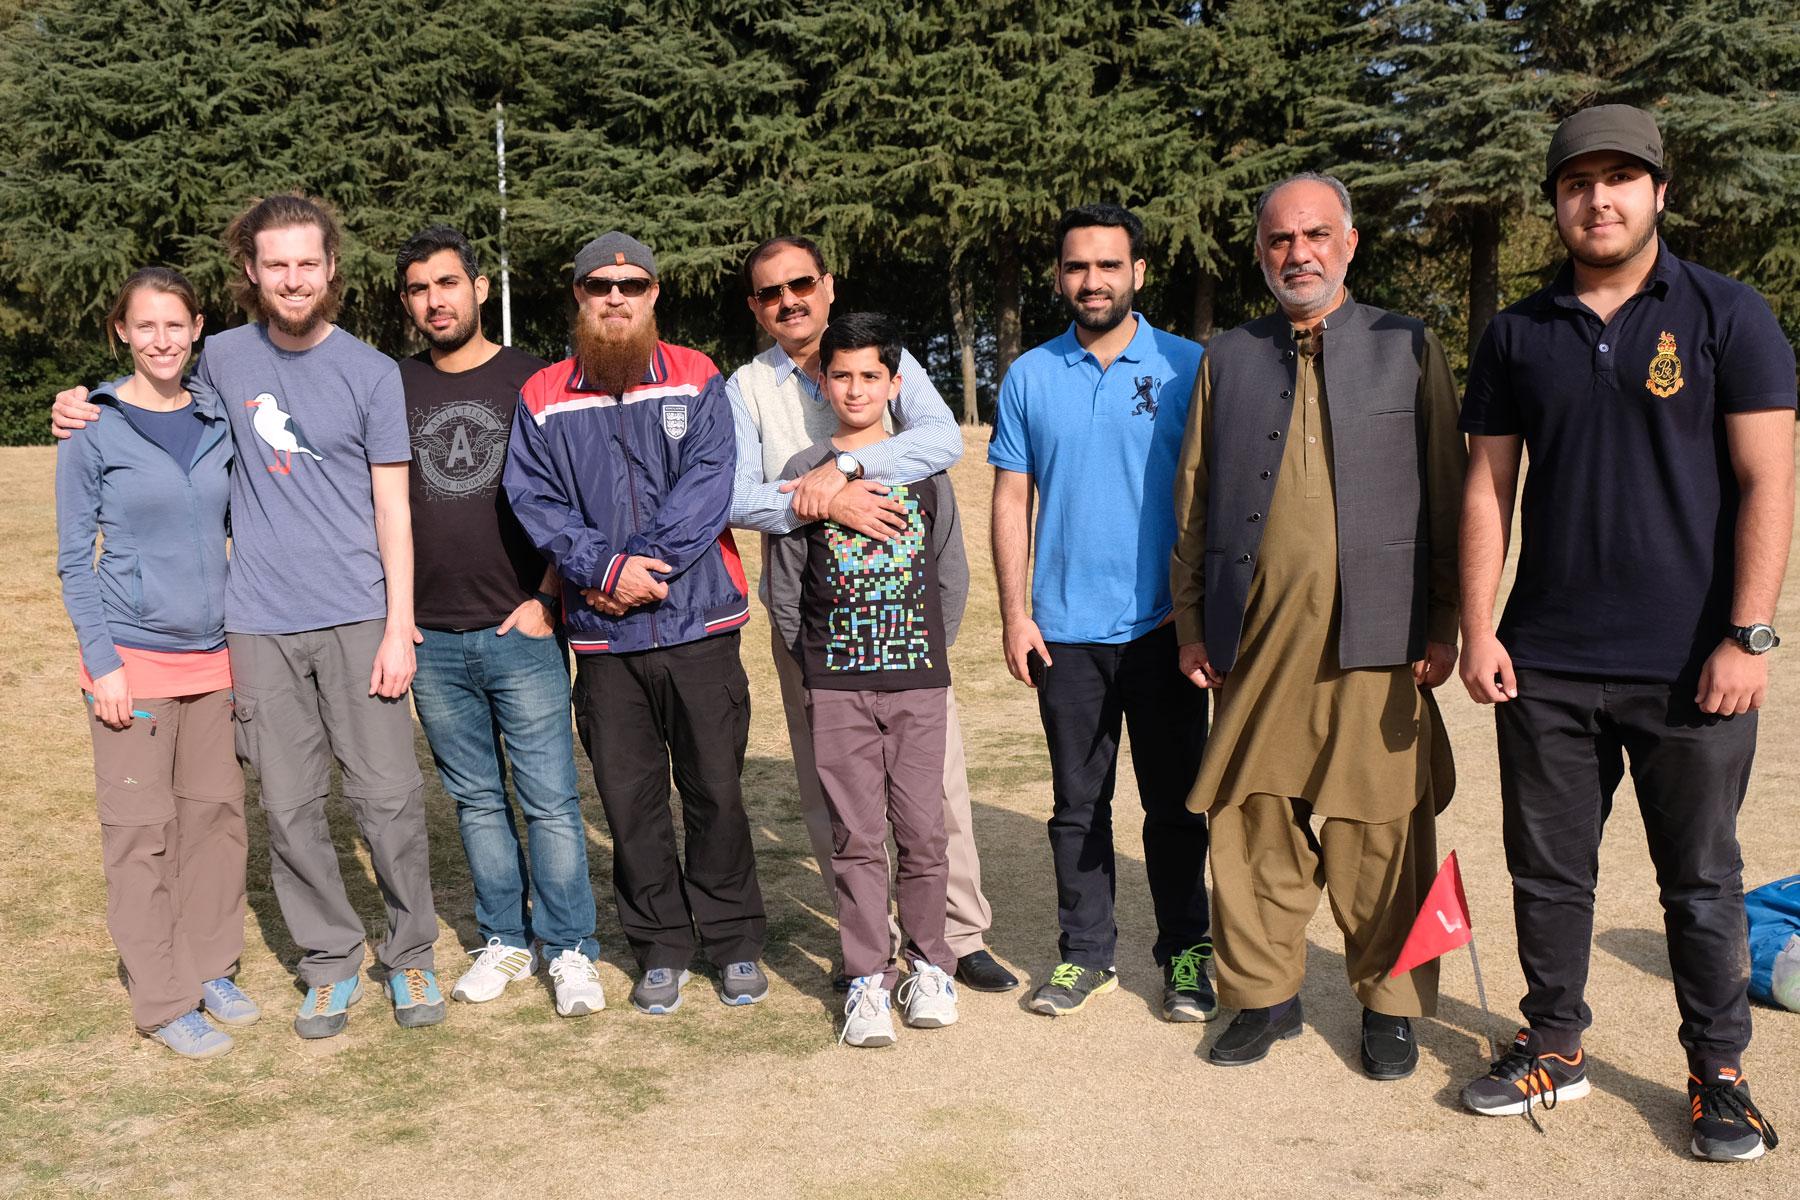 Leo und Sebastian stehen neben pakistanischen Männern.